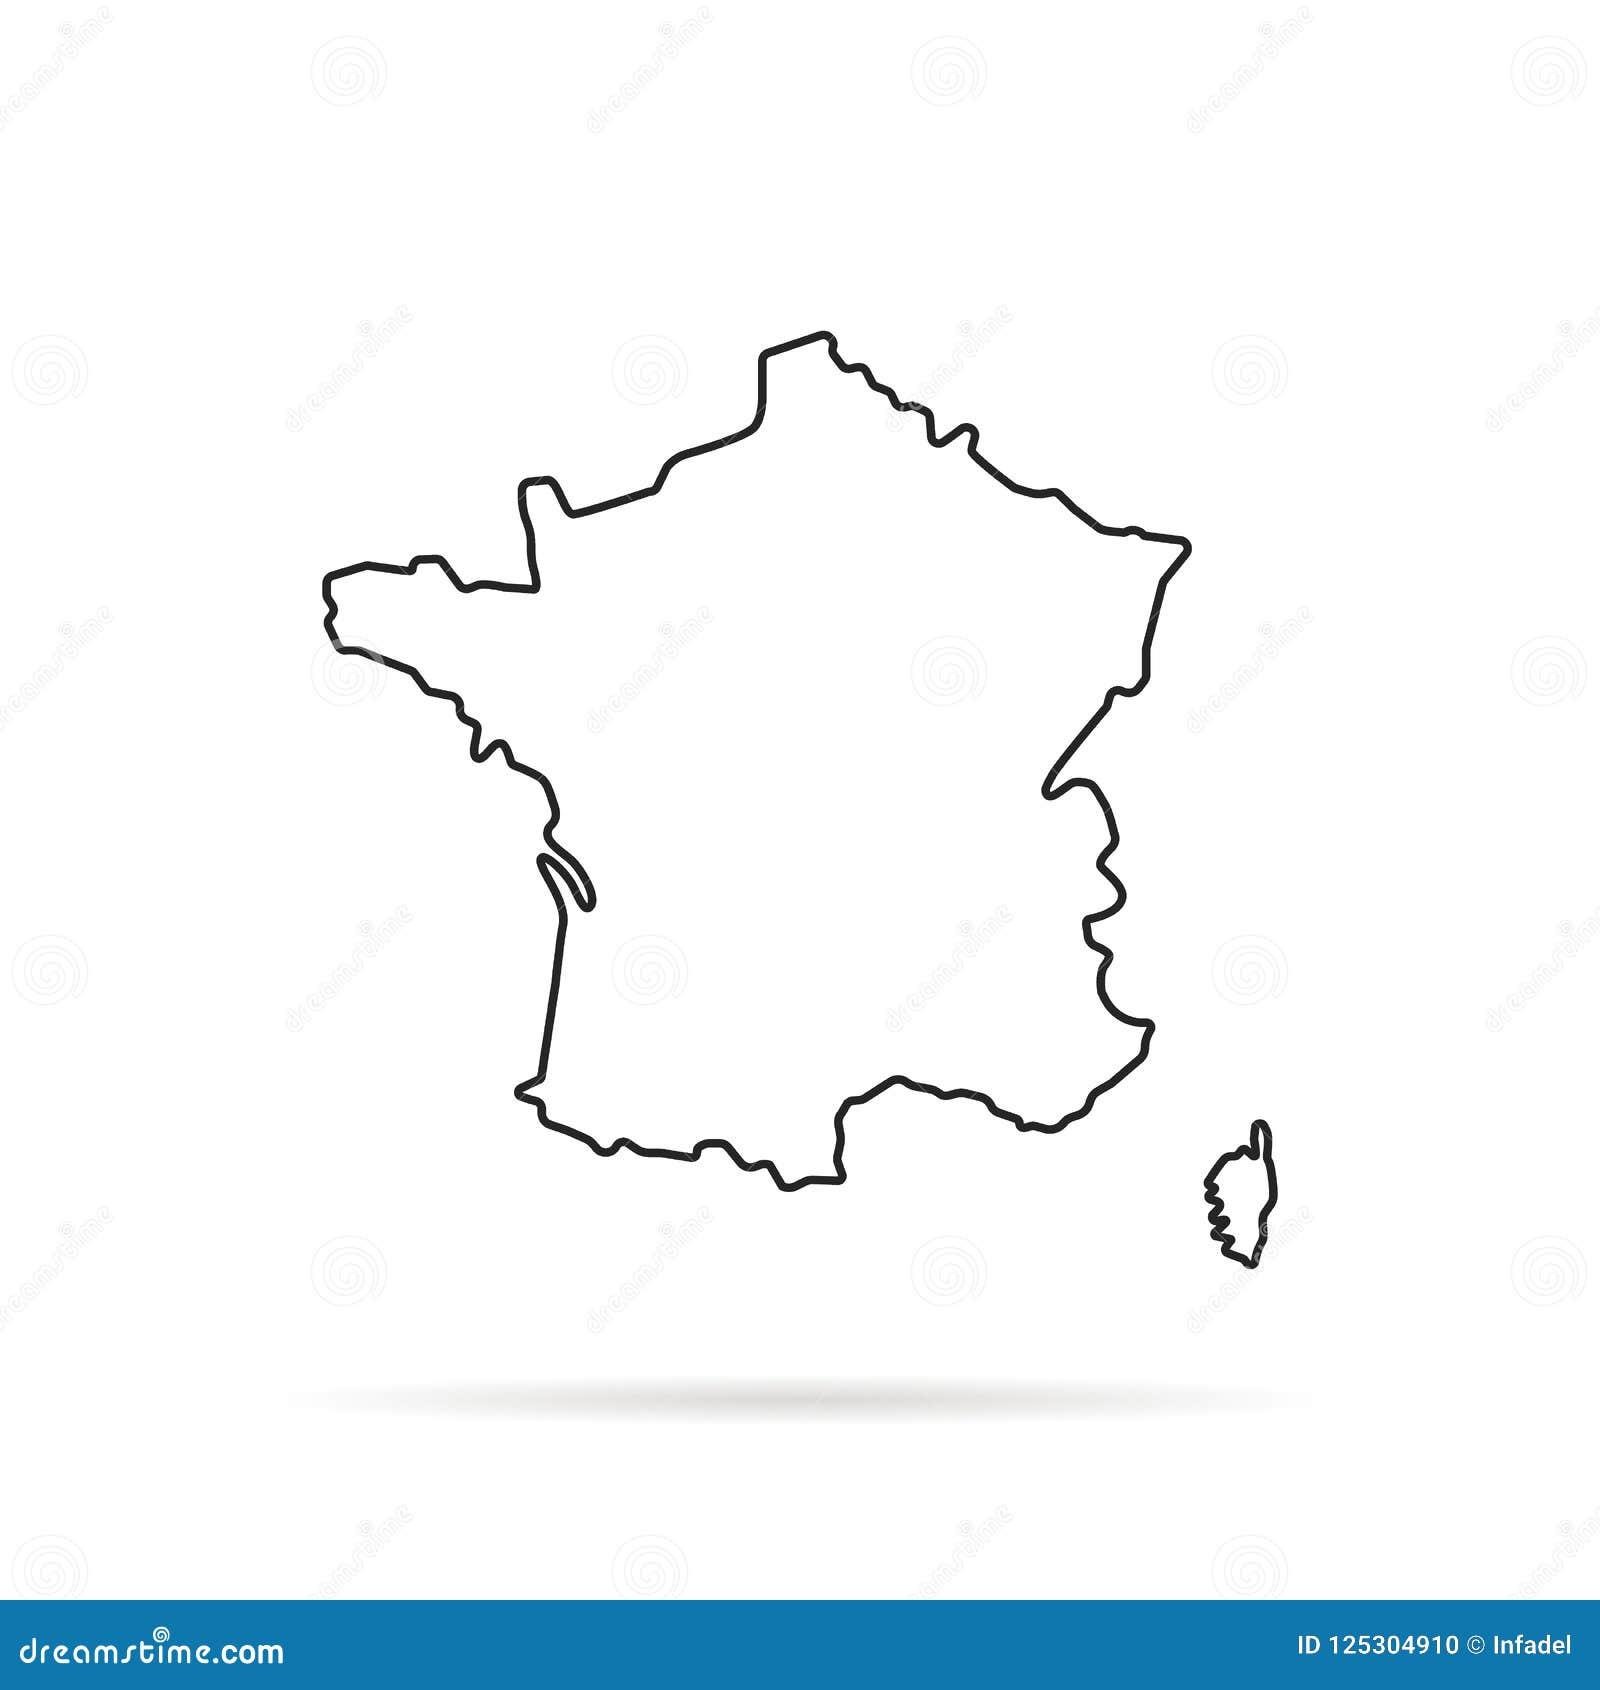 Outline Of Map Of France.Black Outline Hand Drawn Map Of France Stock Vector Illustration